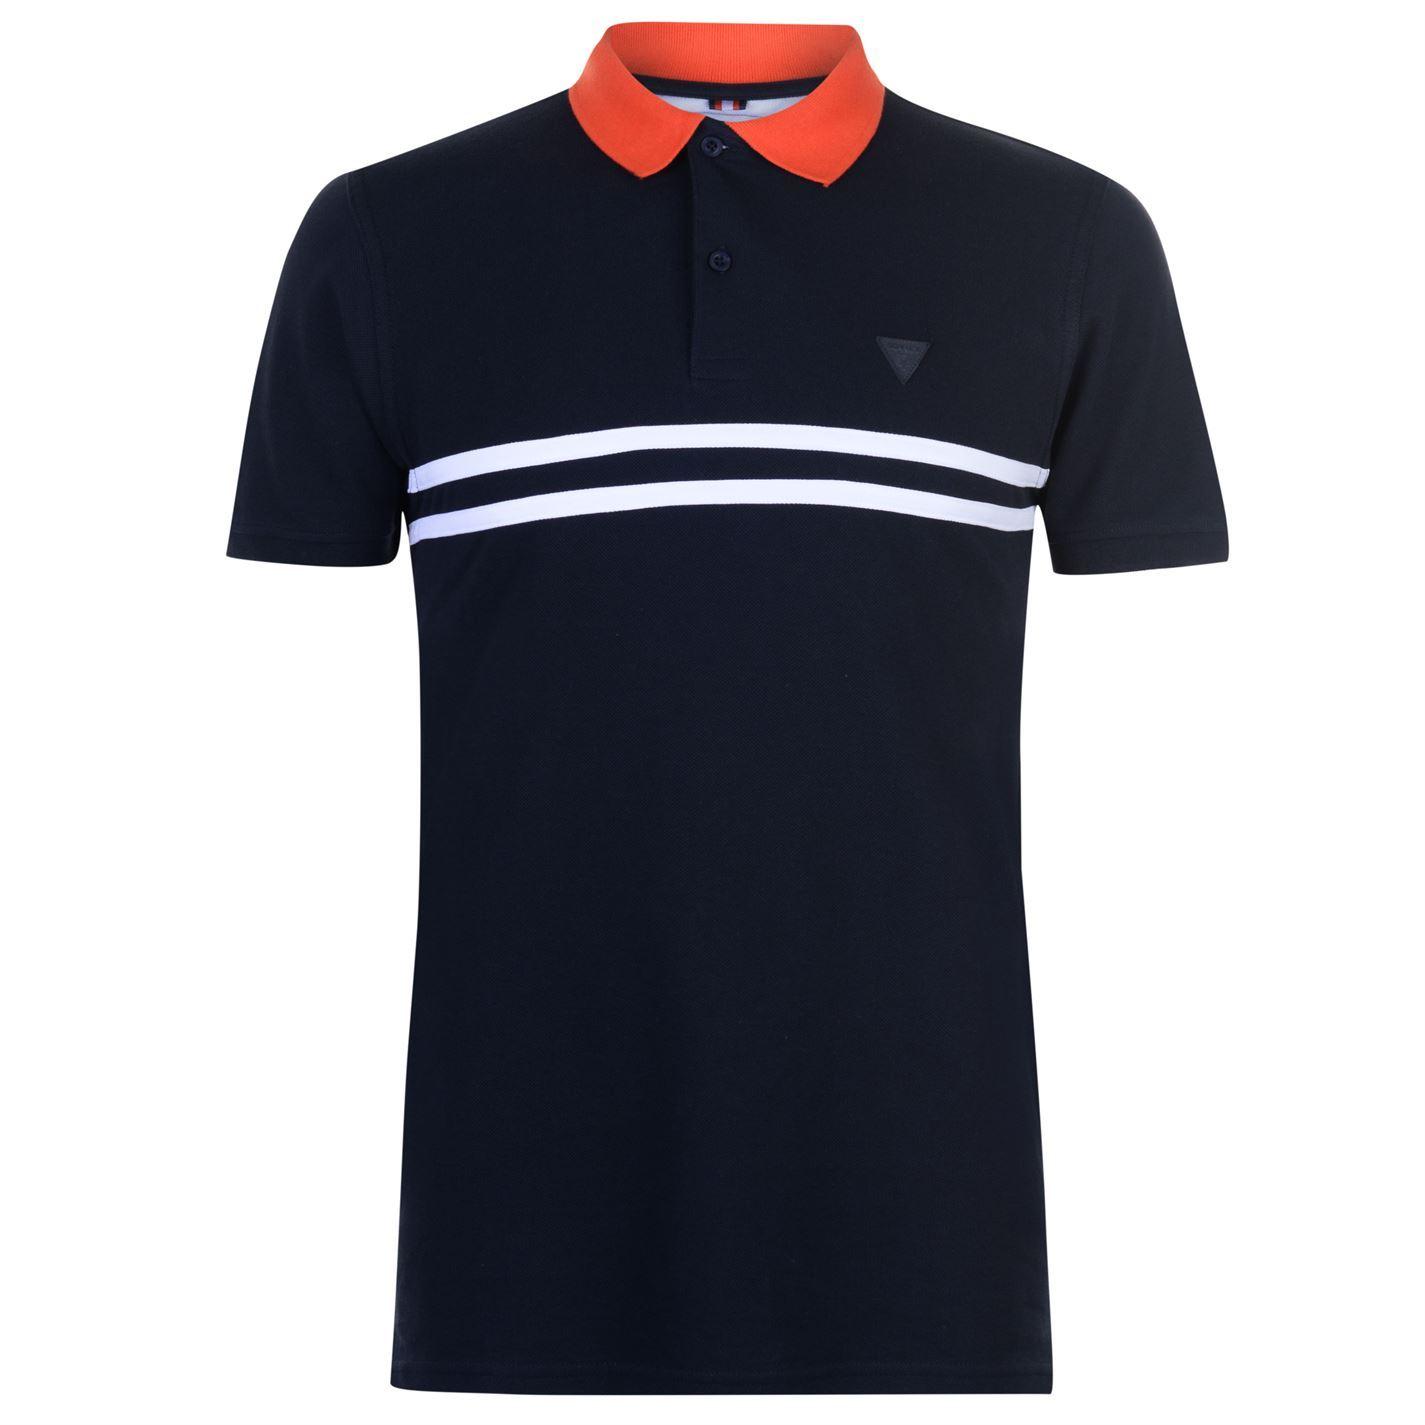 69d46504e Details about Mens Soviet Chest Stripe Polo Shirt Slim Fit Short Sleeve New